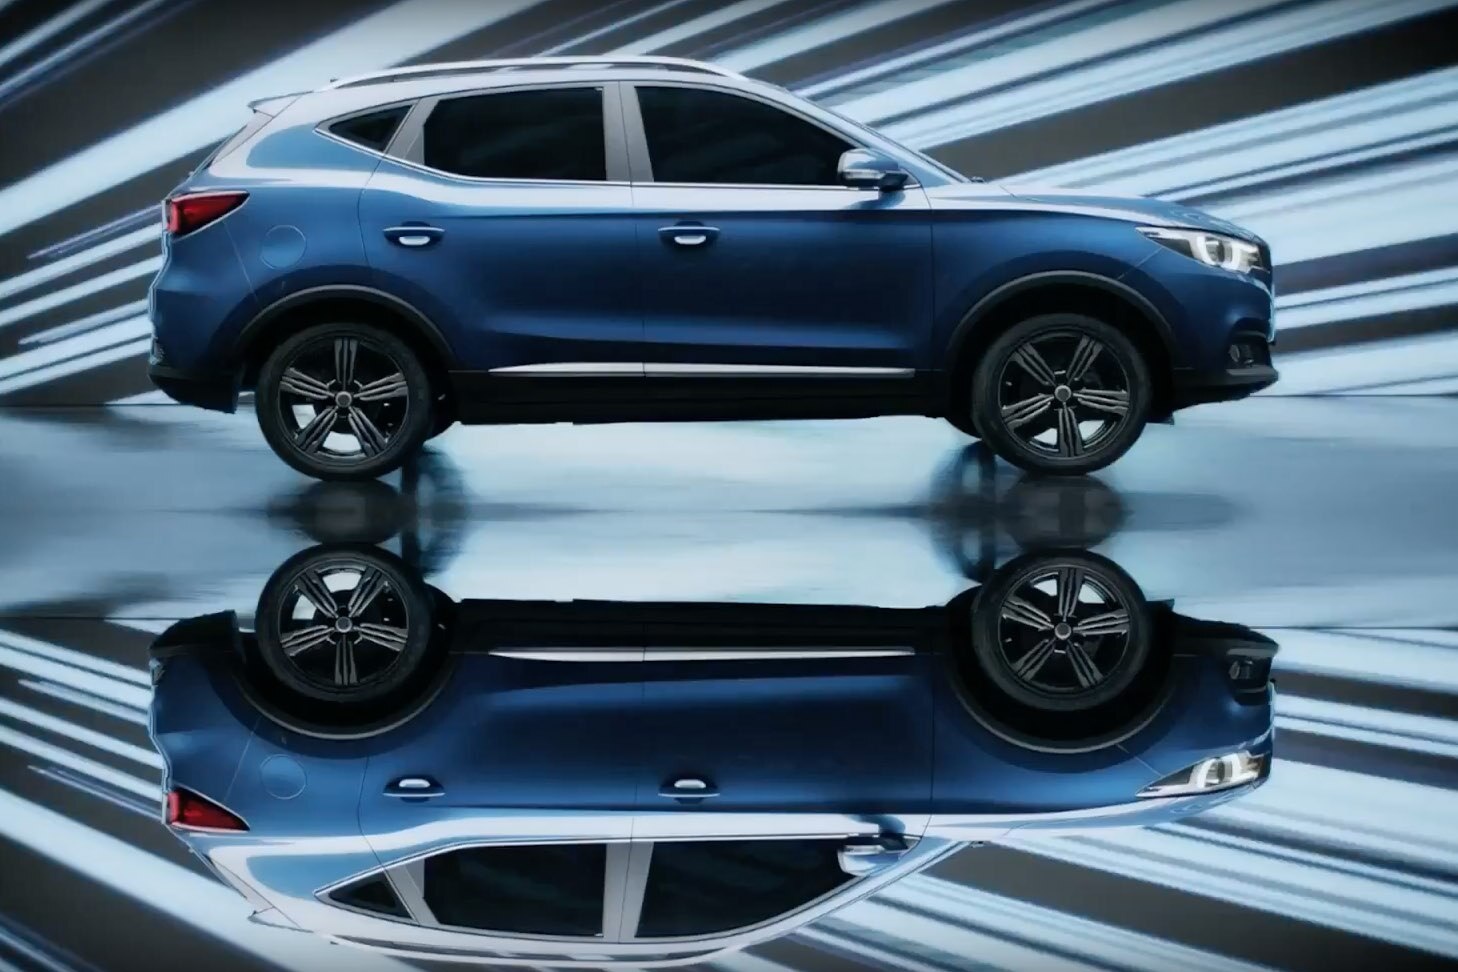 Super Snake 2017 >> 2017 MG ZS SUV Video Revealed | Automobile Magazine